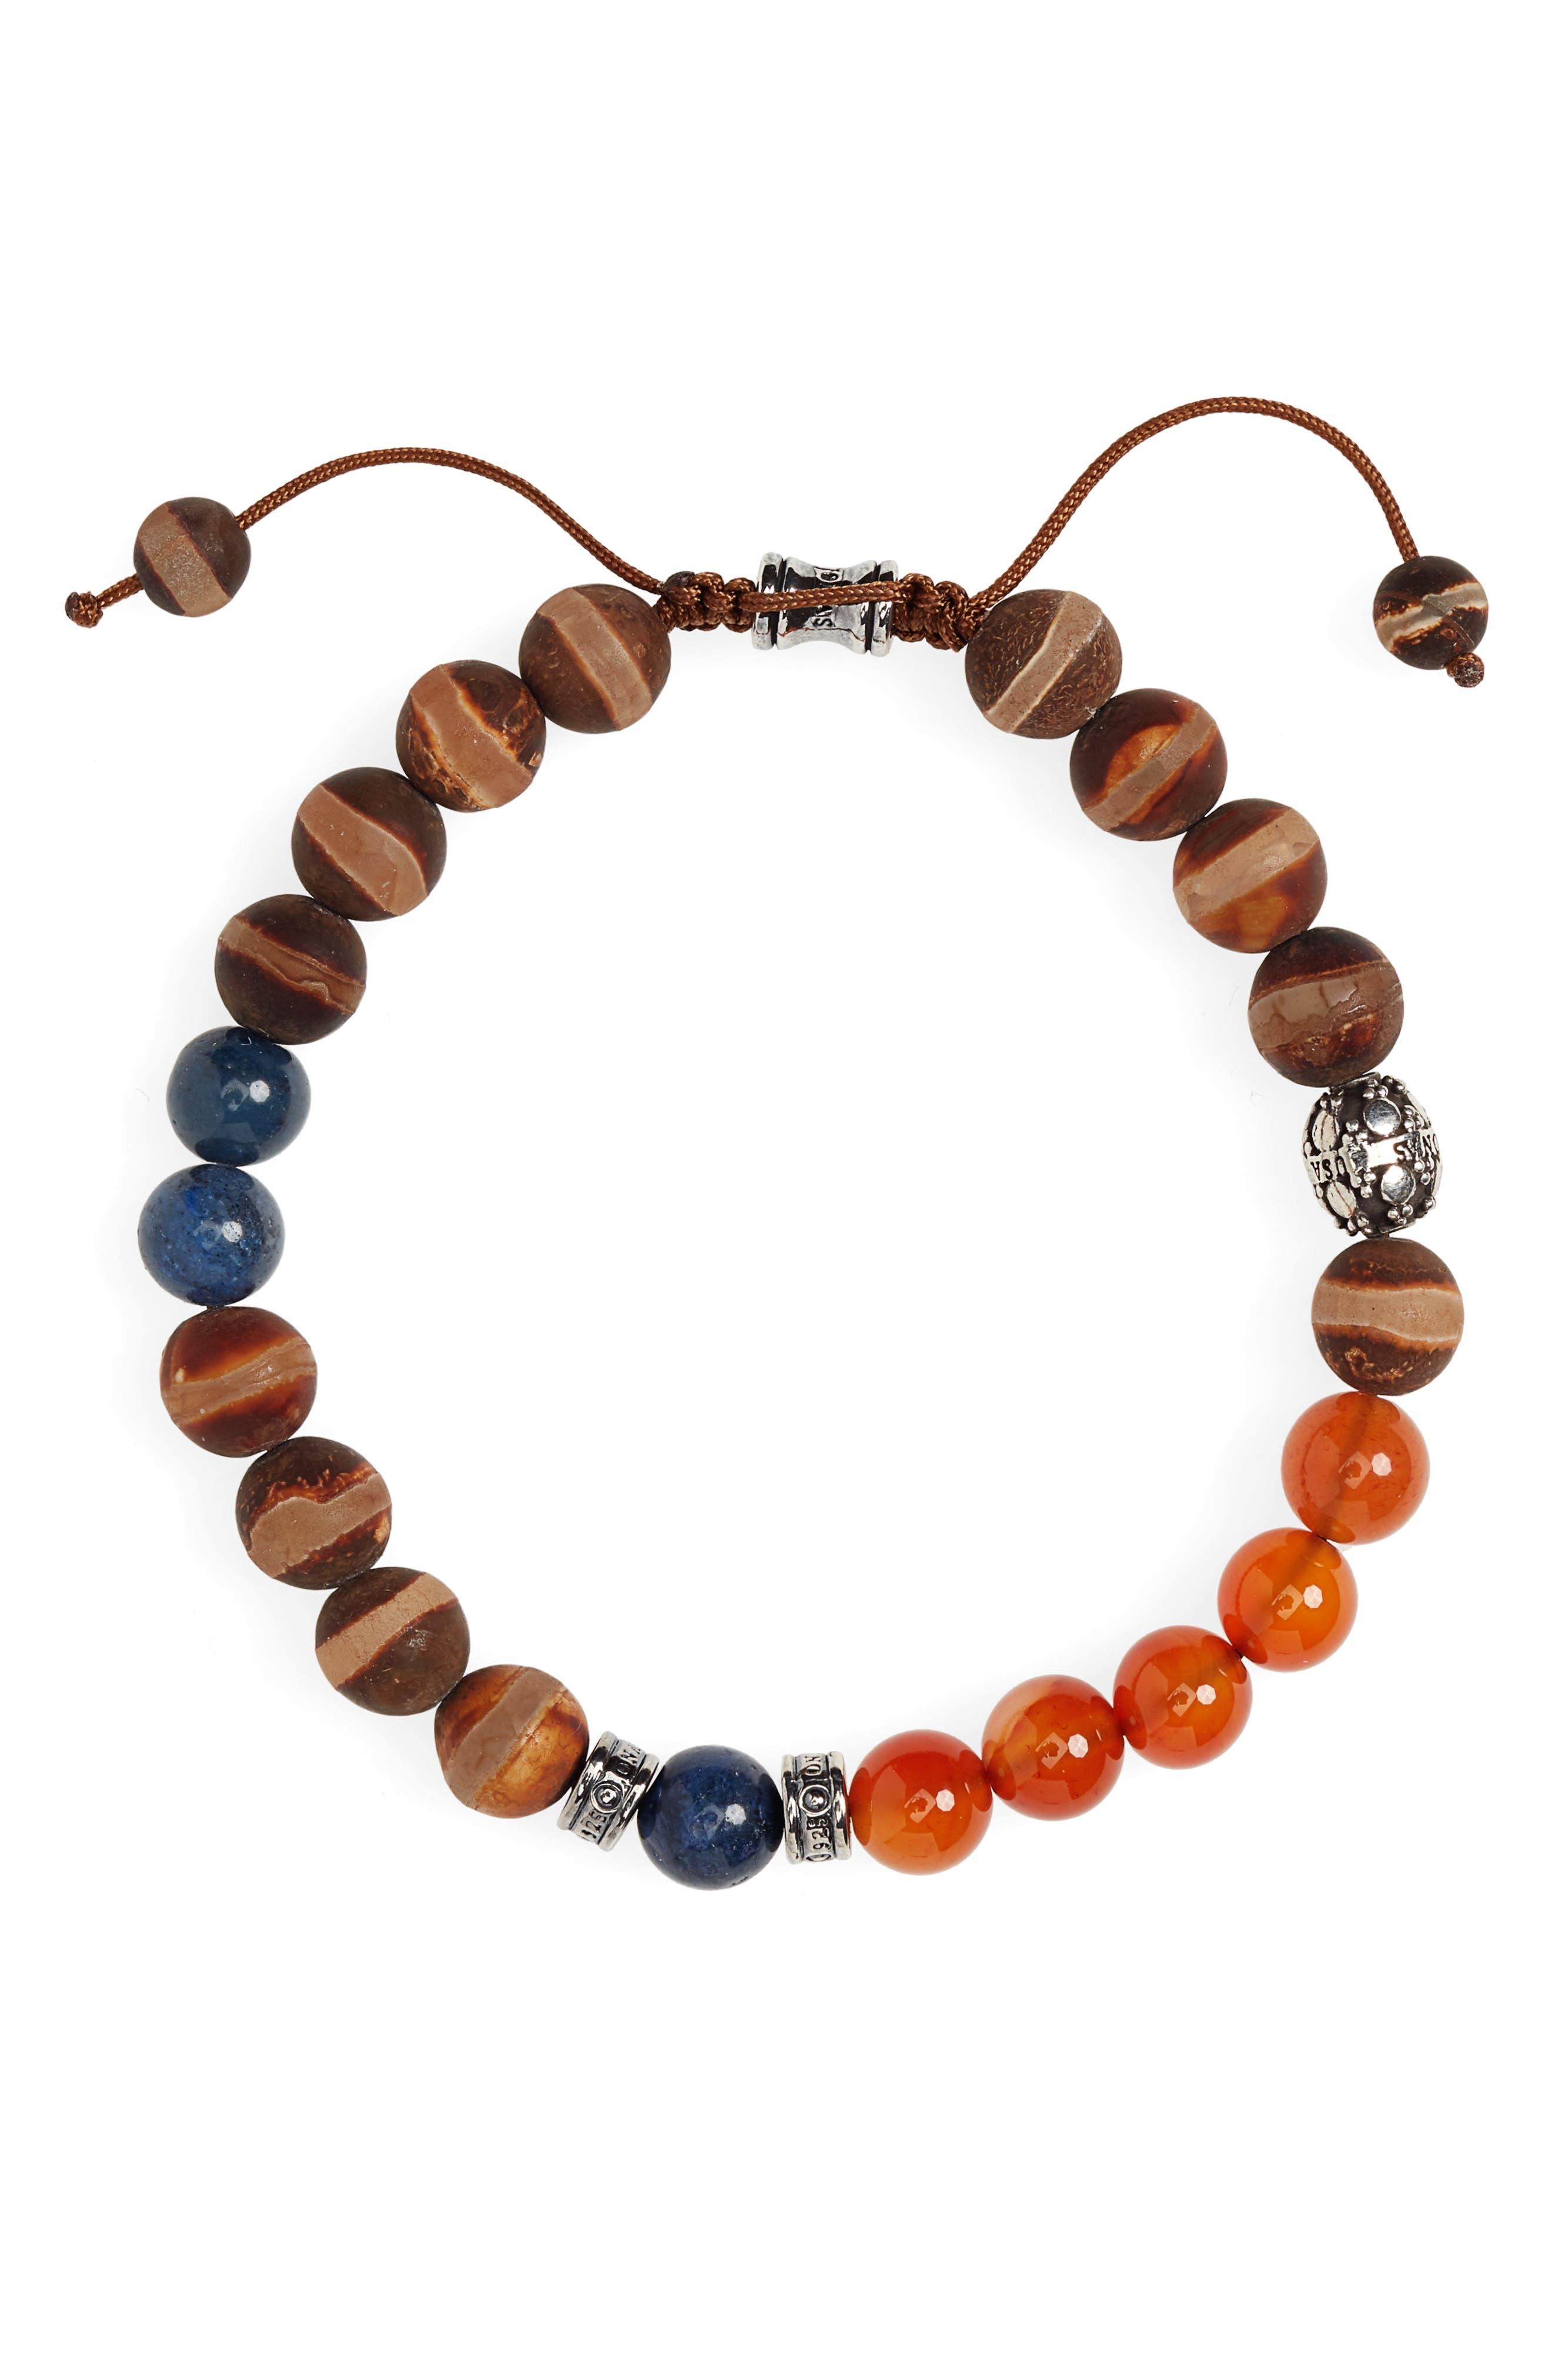 JONAS STUDIO Washington Square Mixed Stone Bracelet in Brown